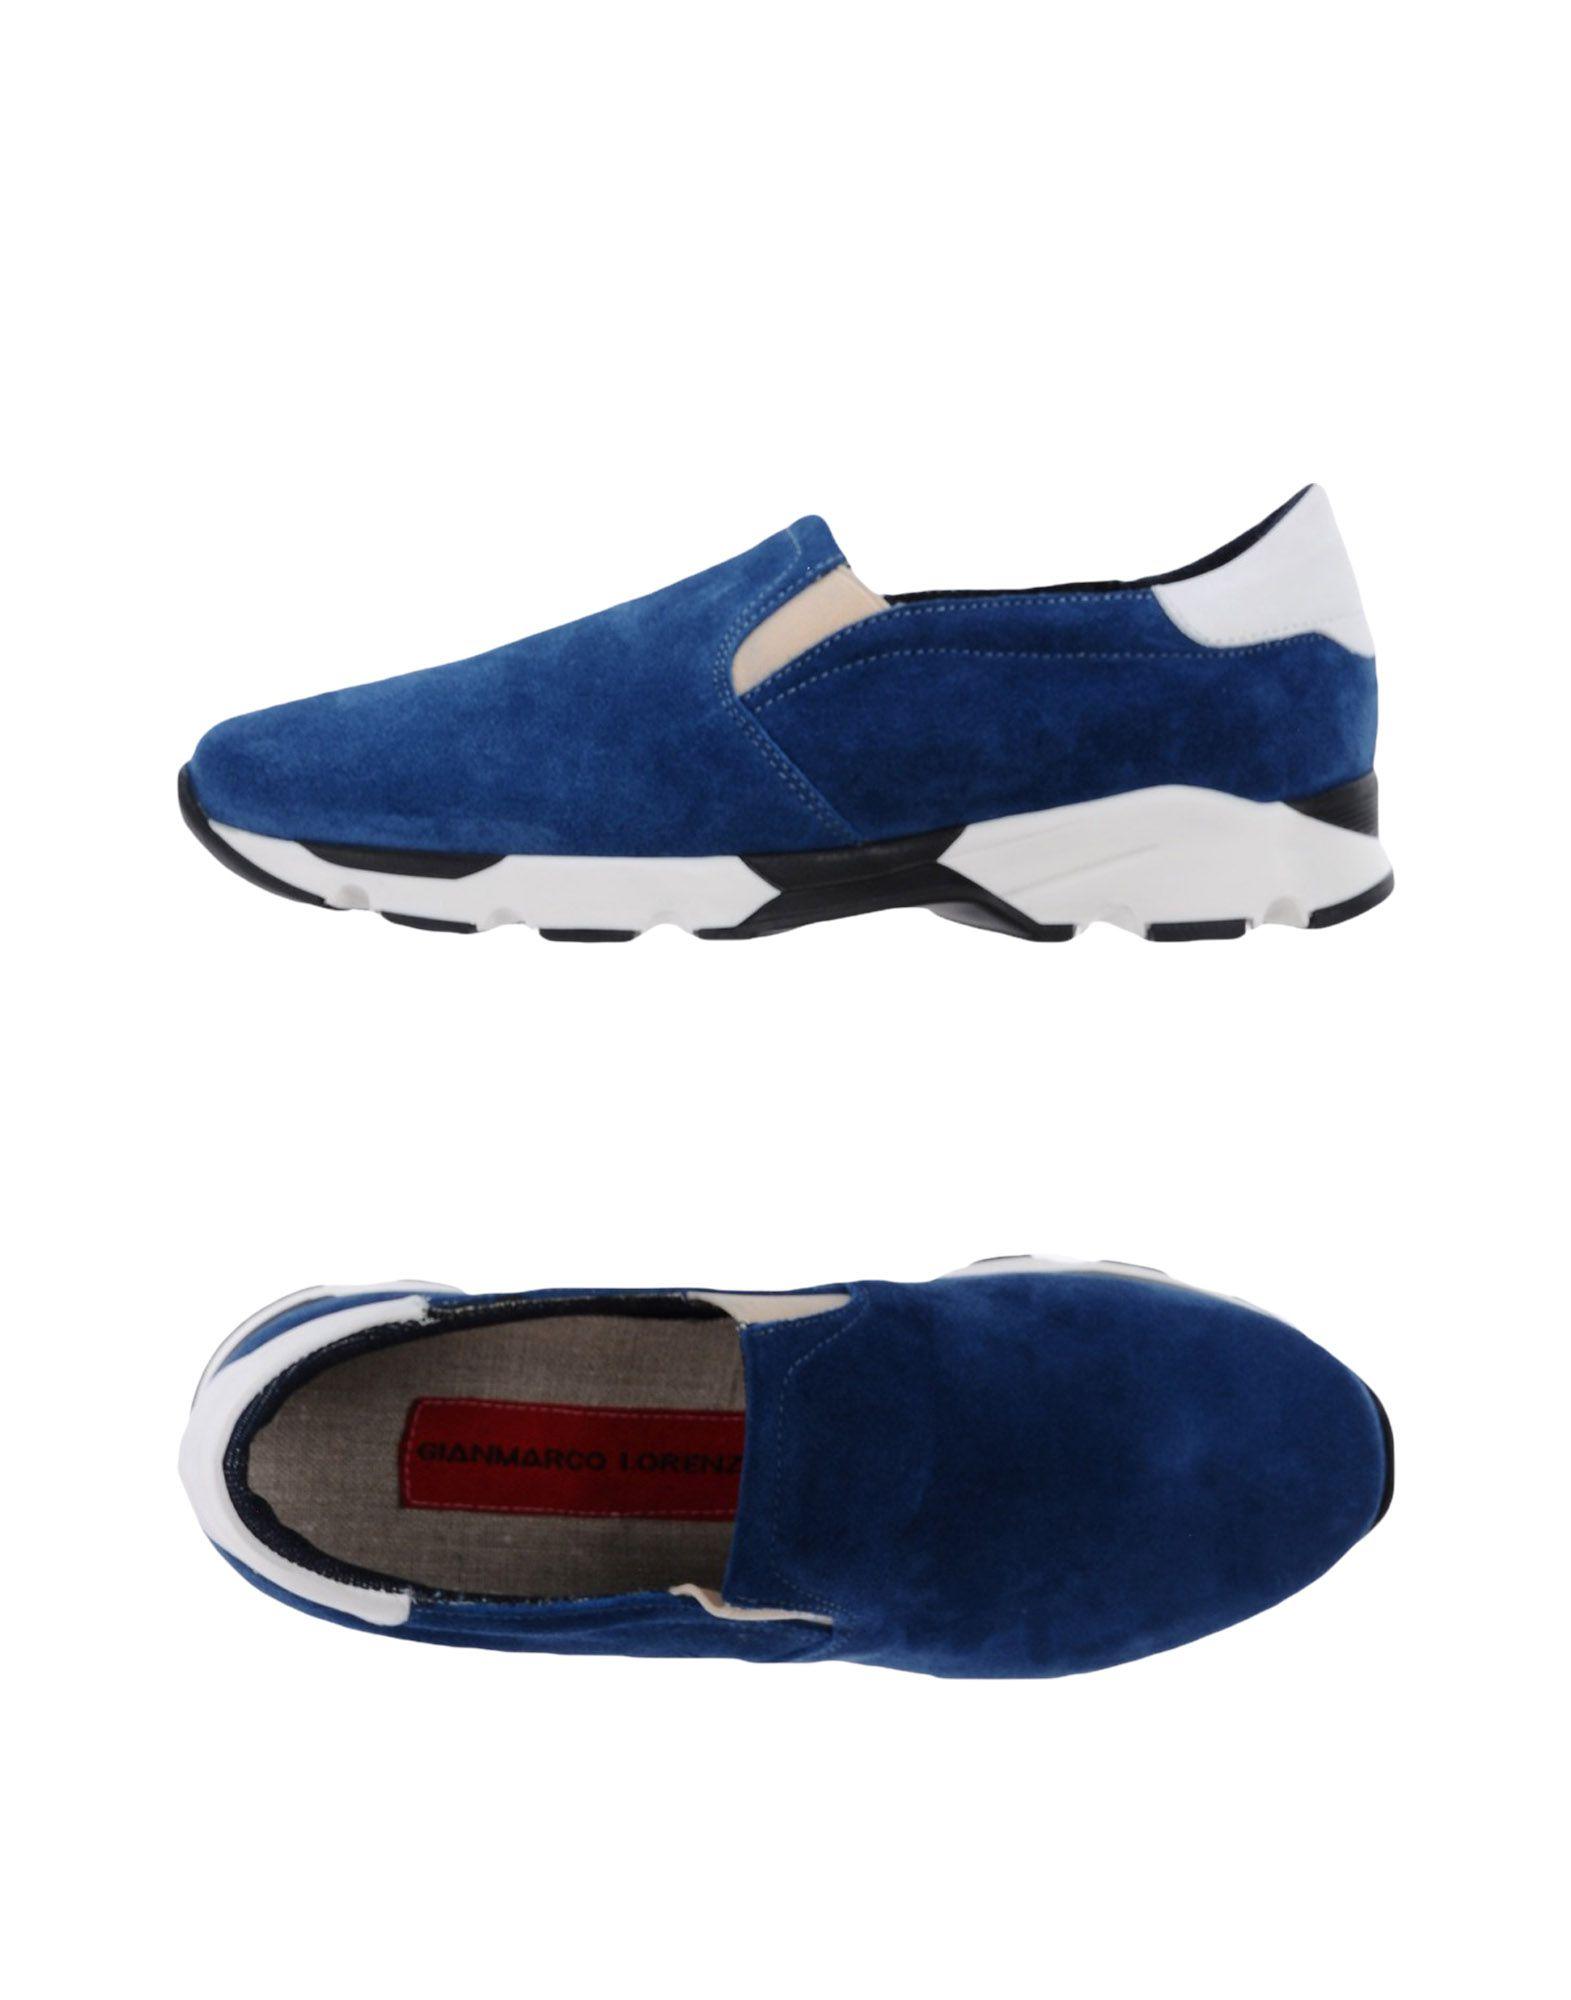 Zapatillas Gianmarco Lorzi Mujer - Zapatillas Gianmarco  Lorzi  Gianmarco Azul pastel 565dde